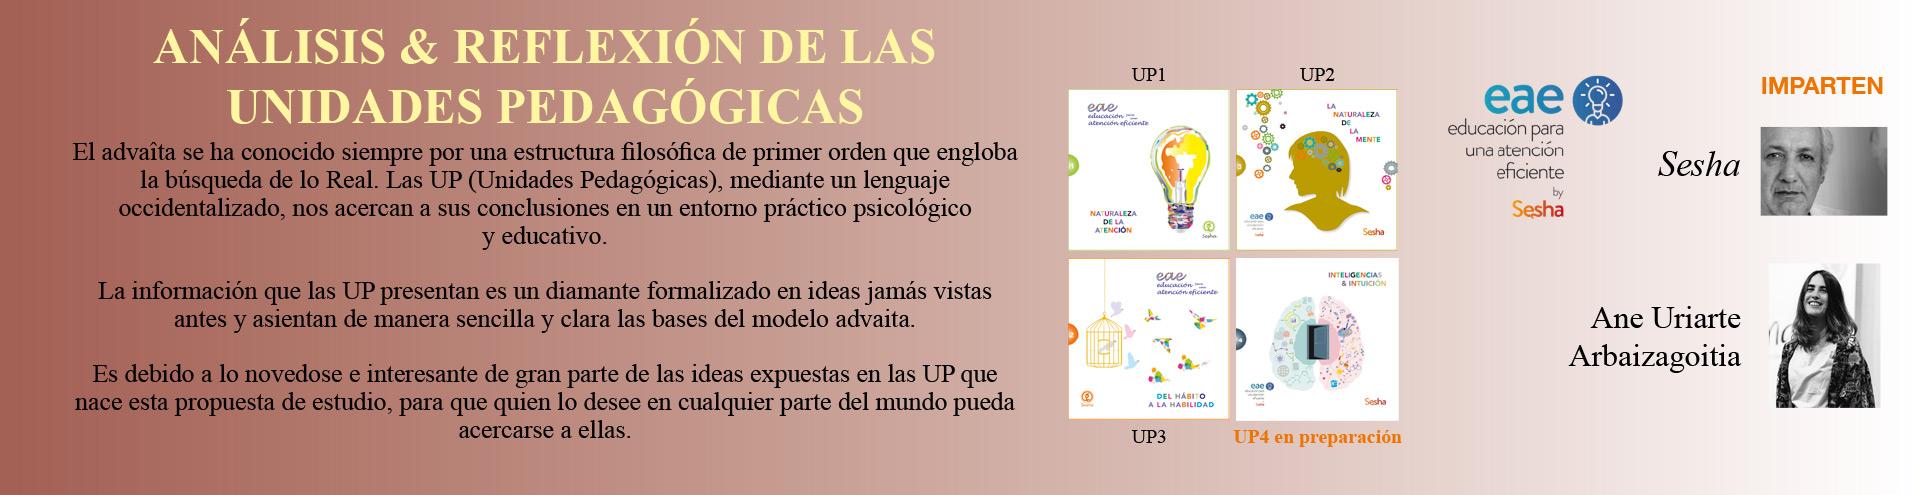 unidades-pedagogicas